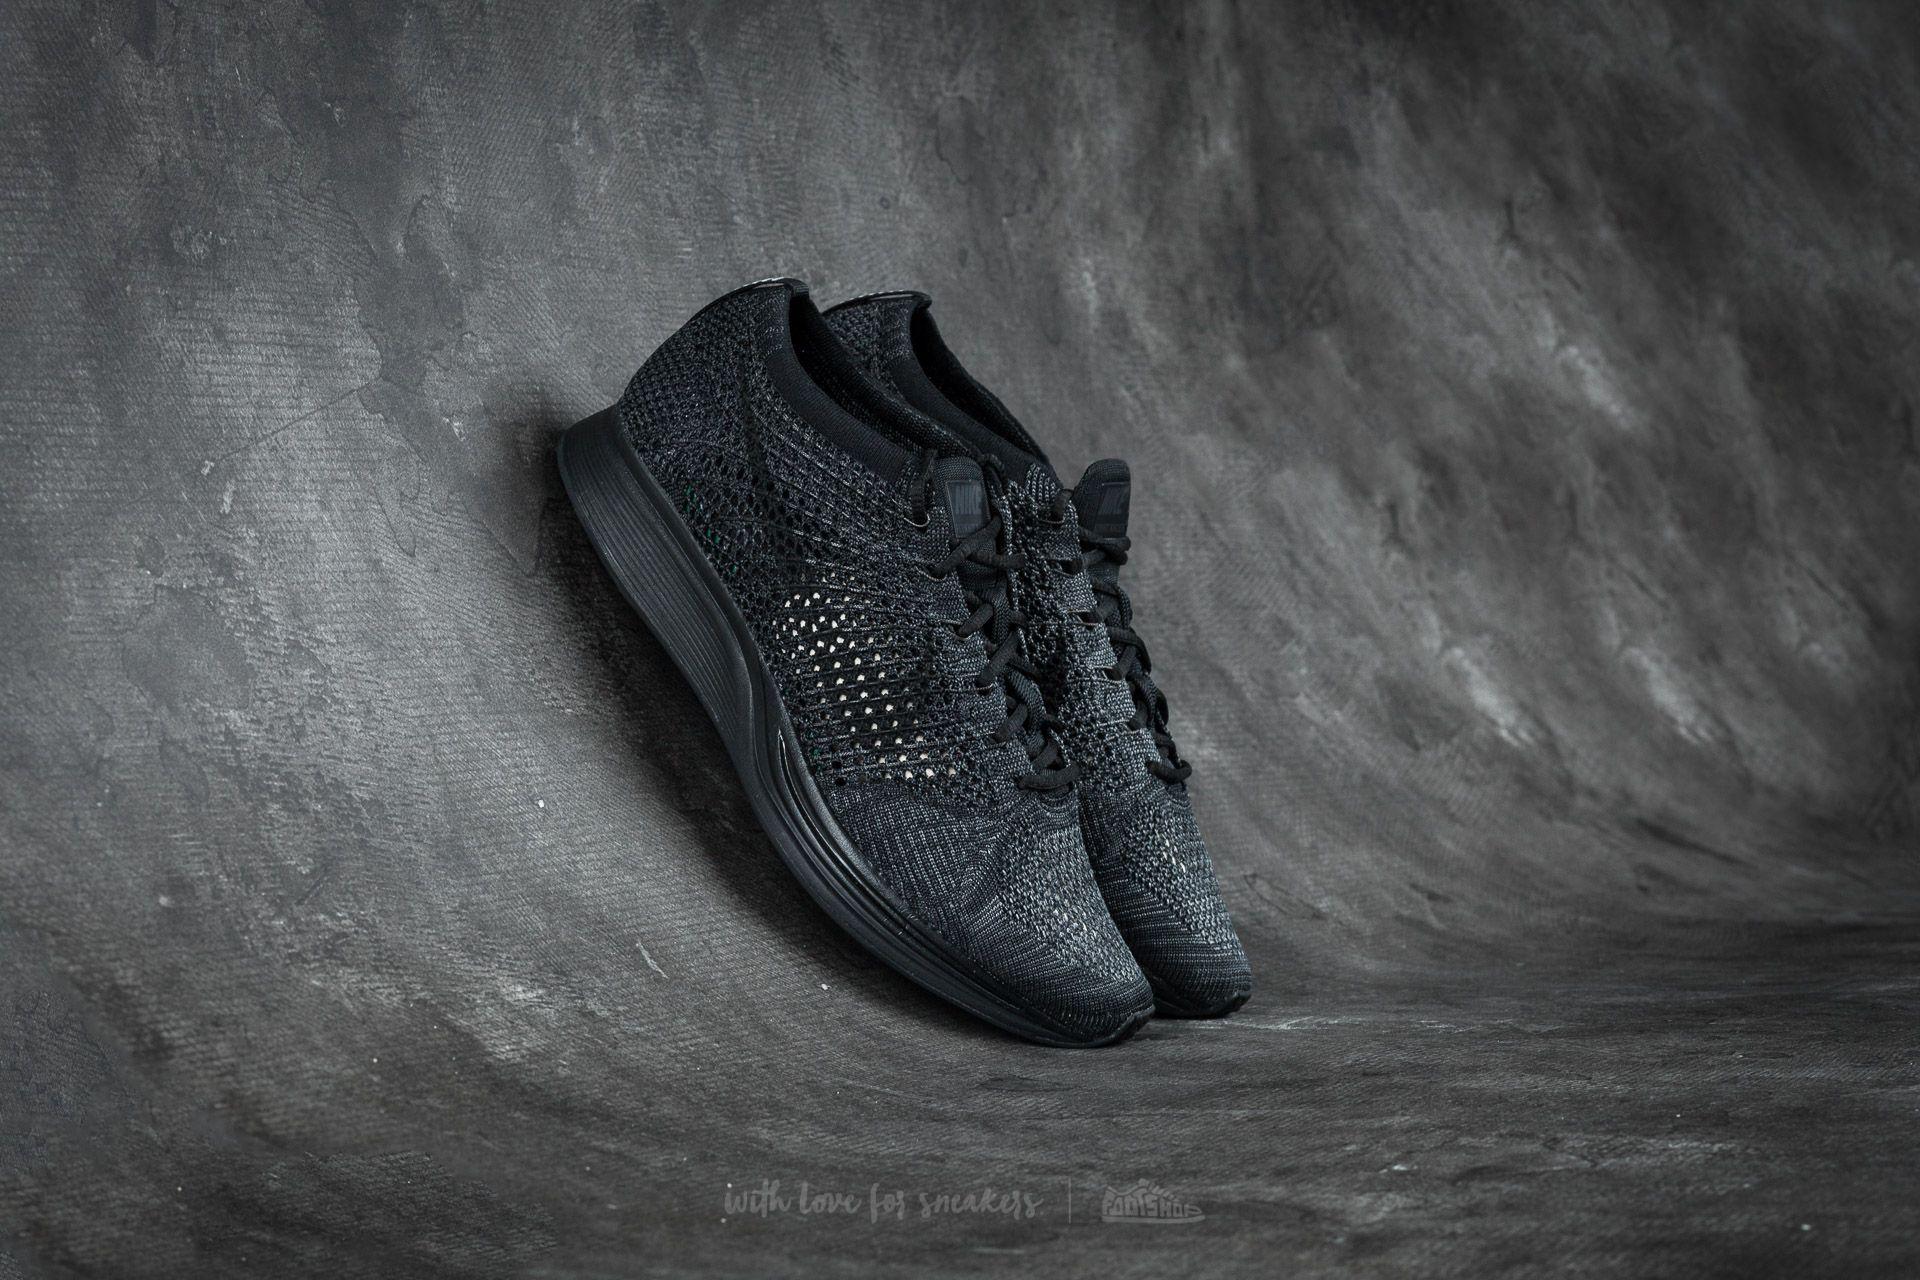 Nike Flyknit Racer Black/ Black-Anthracite